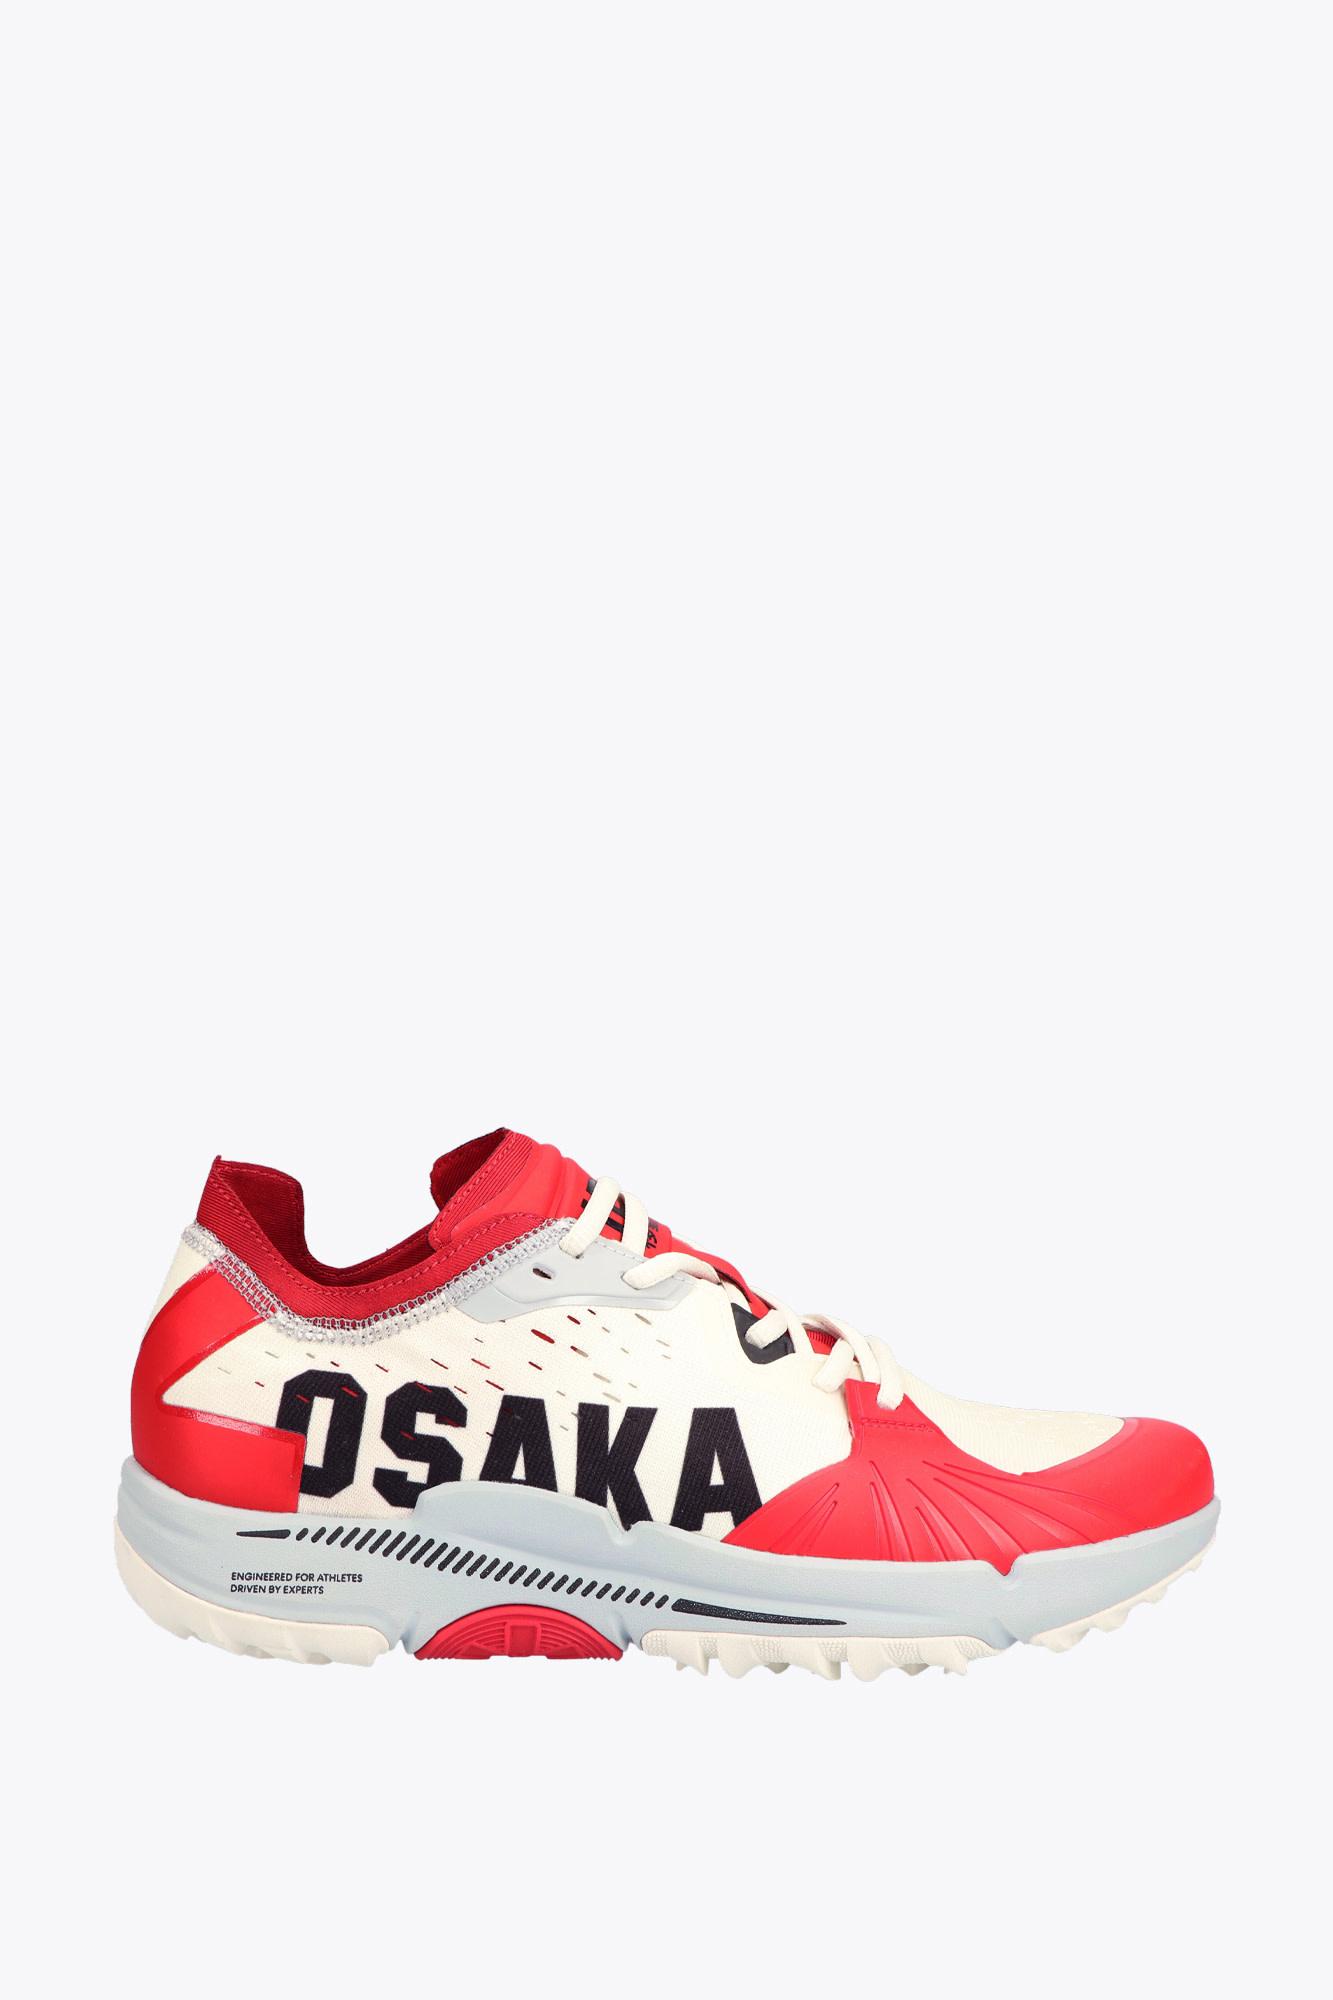 Osaka Osaka Ido MK1 Japan edition